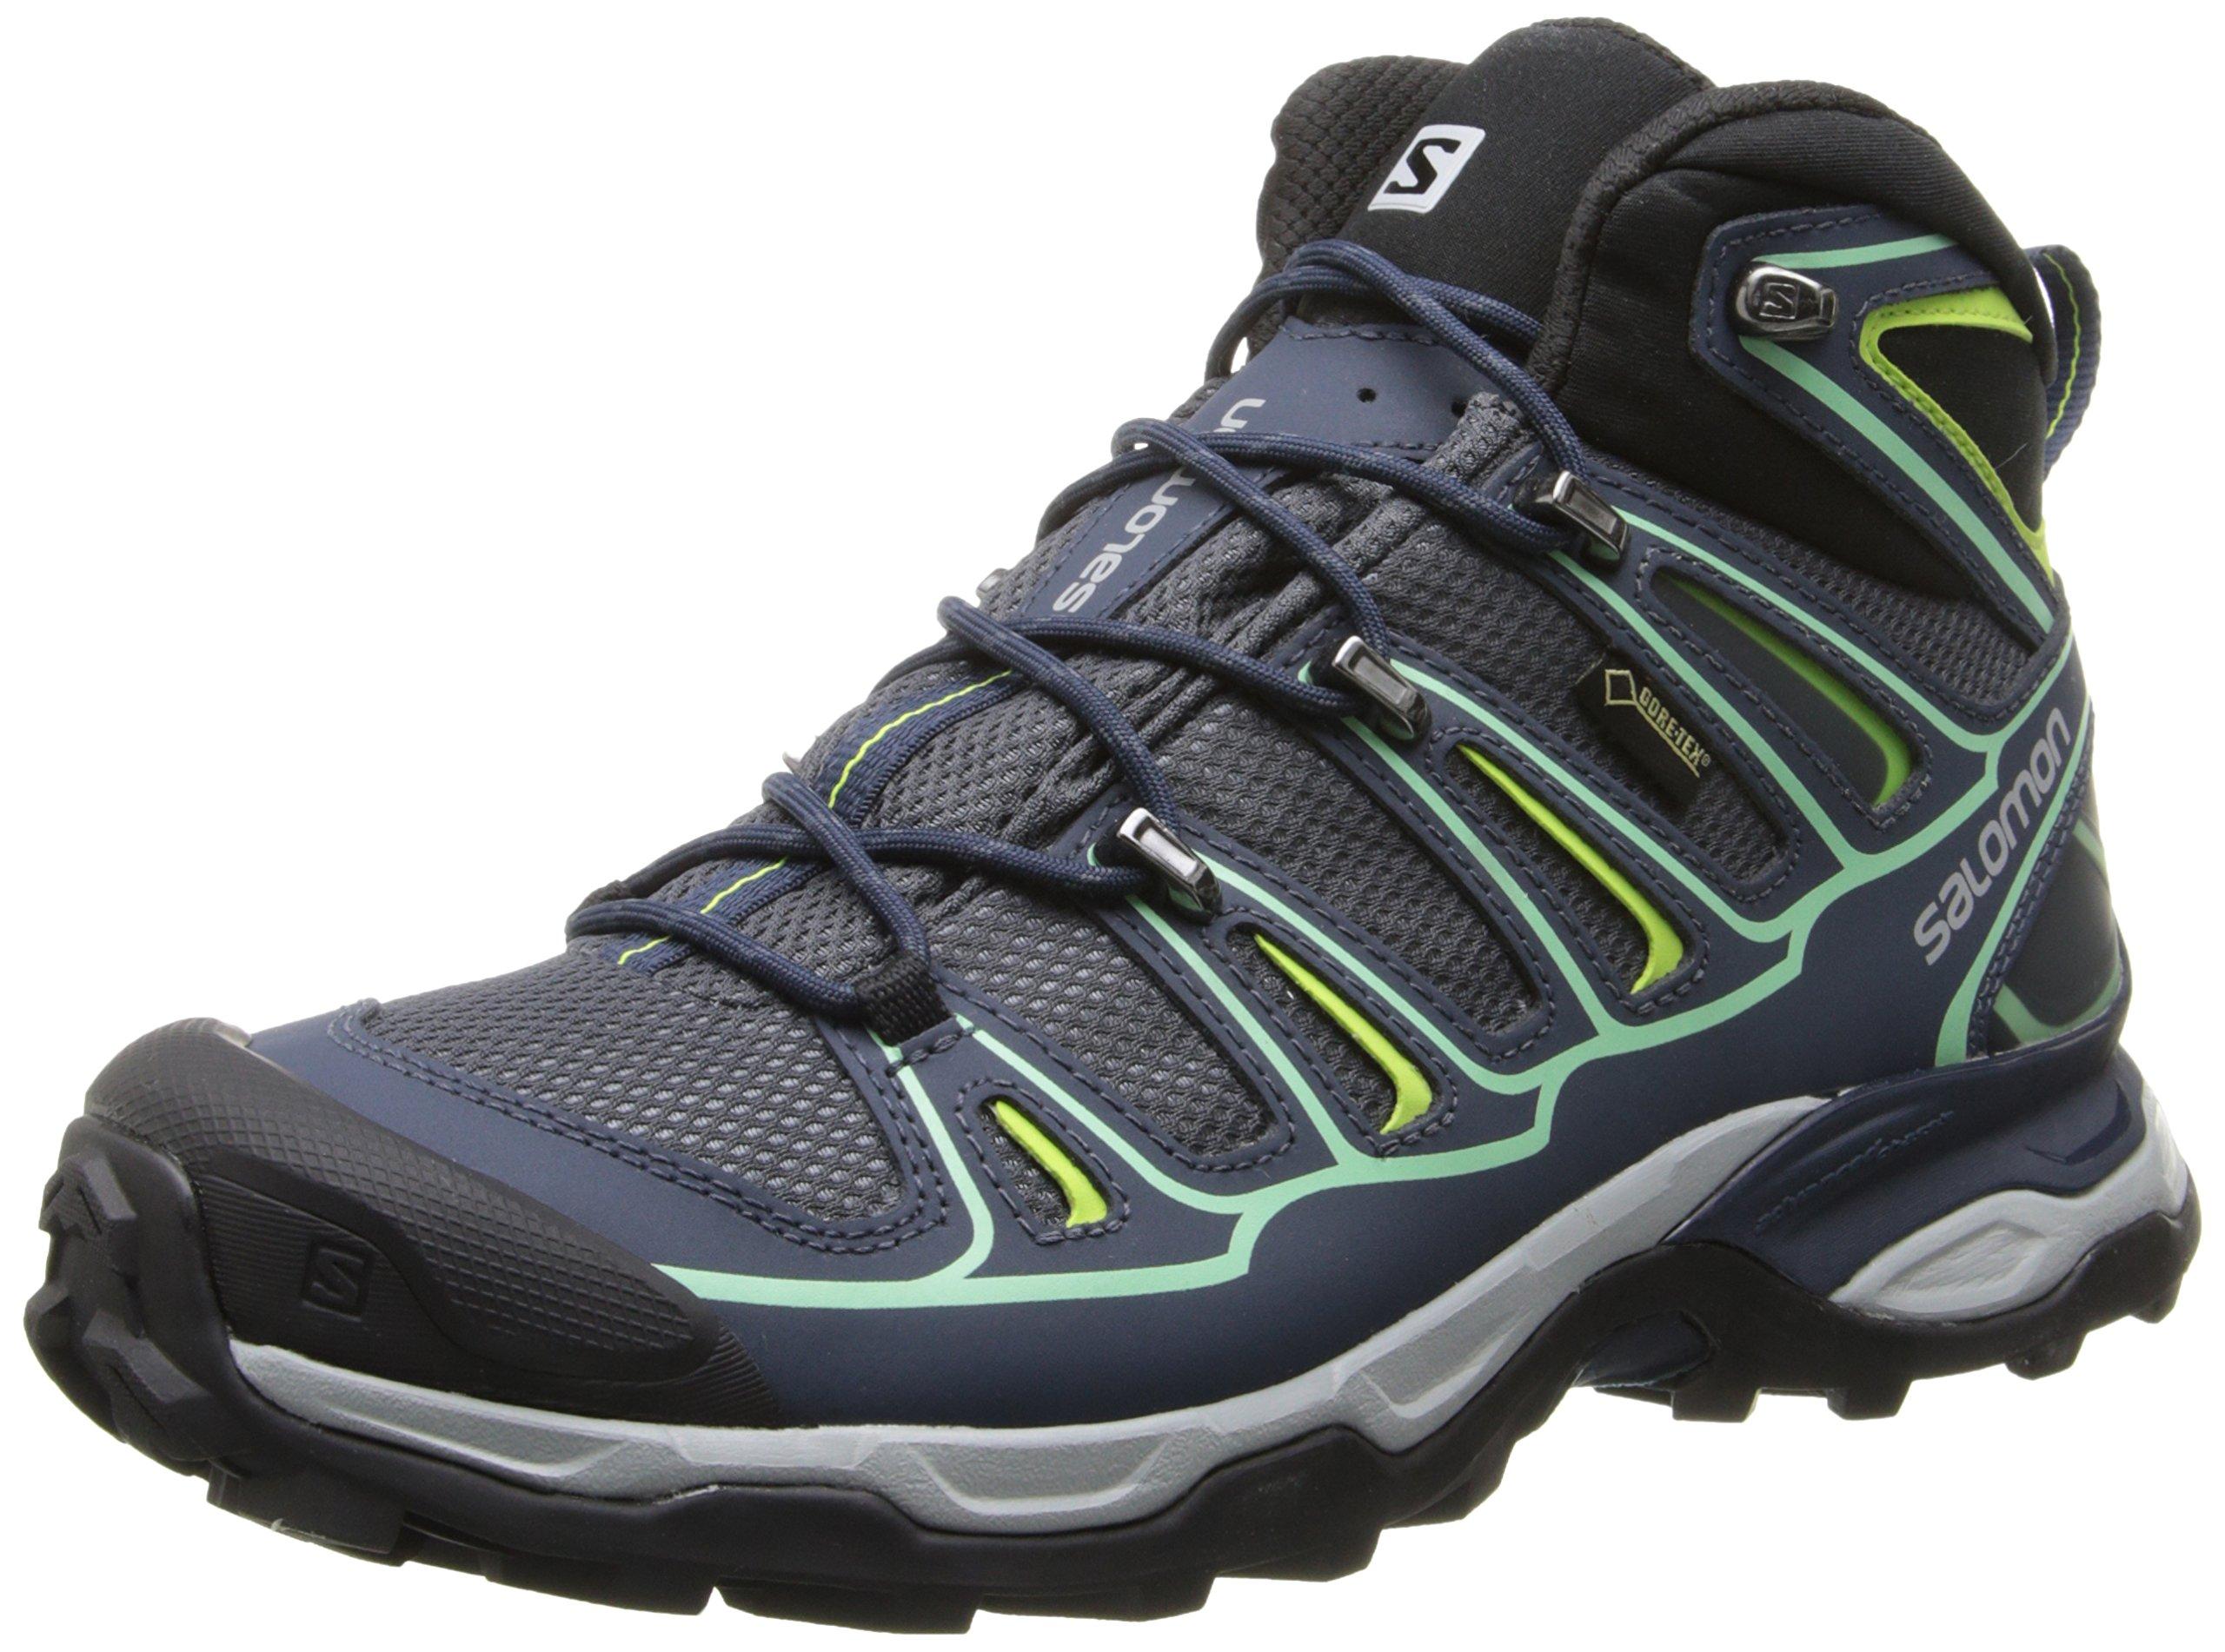 Salomon Women's X Ultra Mid 2 GTX Hiking Shoe, Grey Denim/Deep Blue/Lucite Green, 9 M US by Salomon (Image #1)